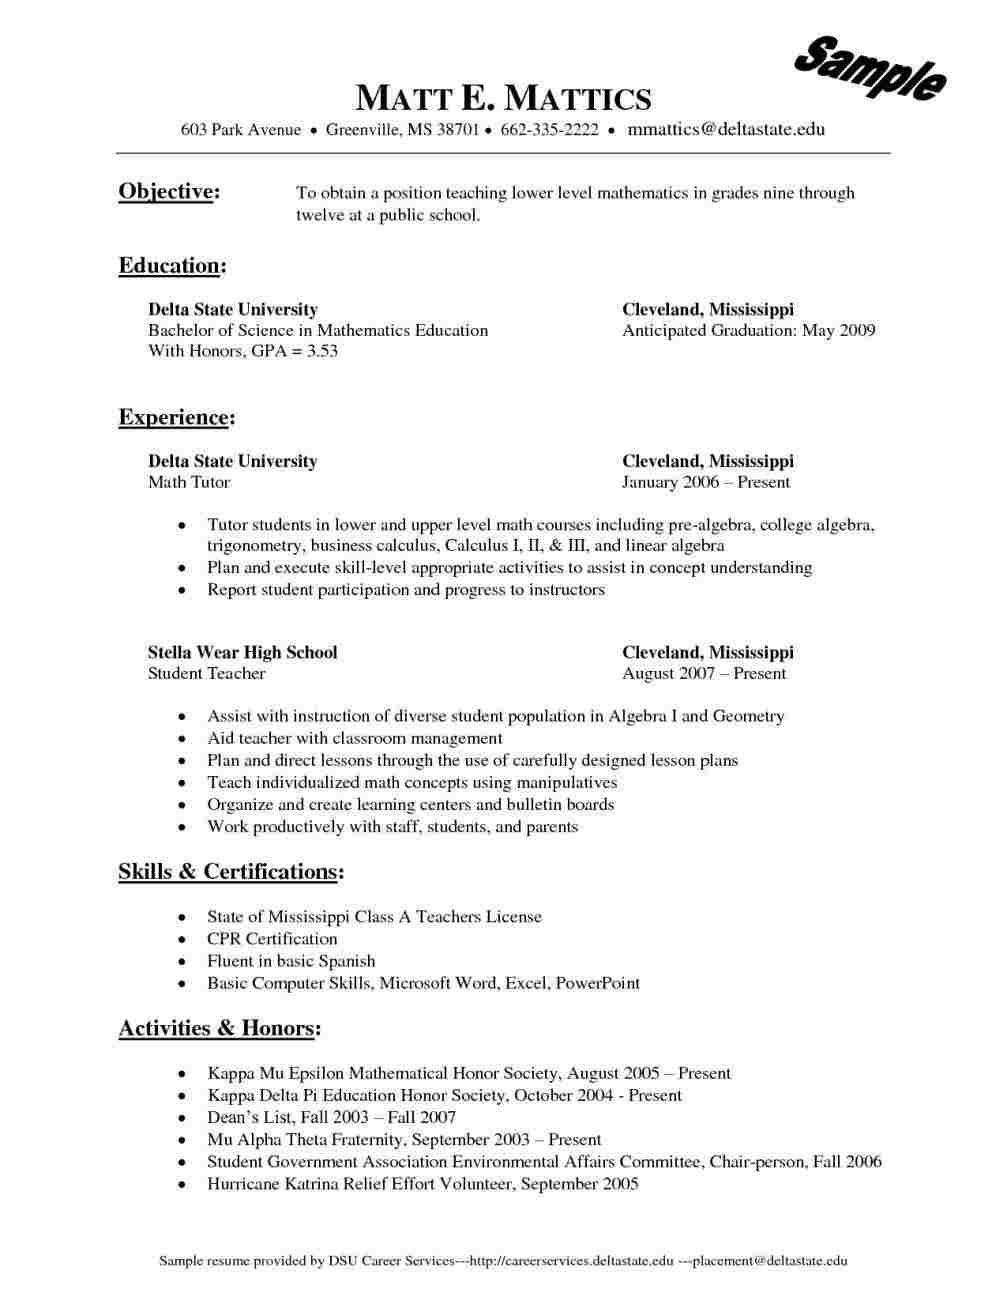 Polaris Office 5 Resume Templates Teacher Resume Math Tutor Lesson Plan Format